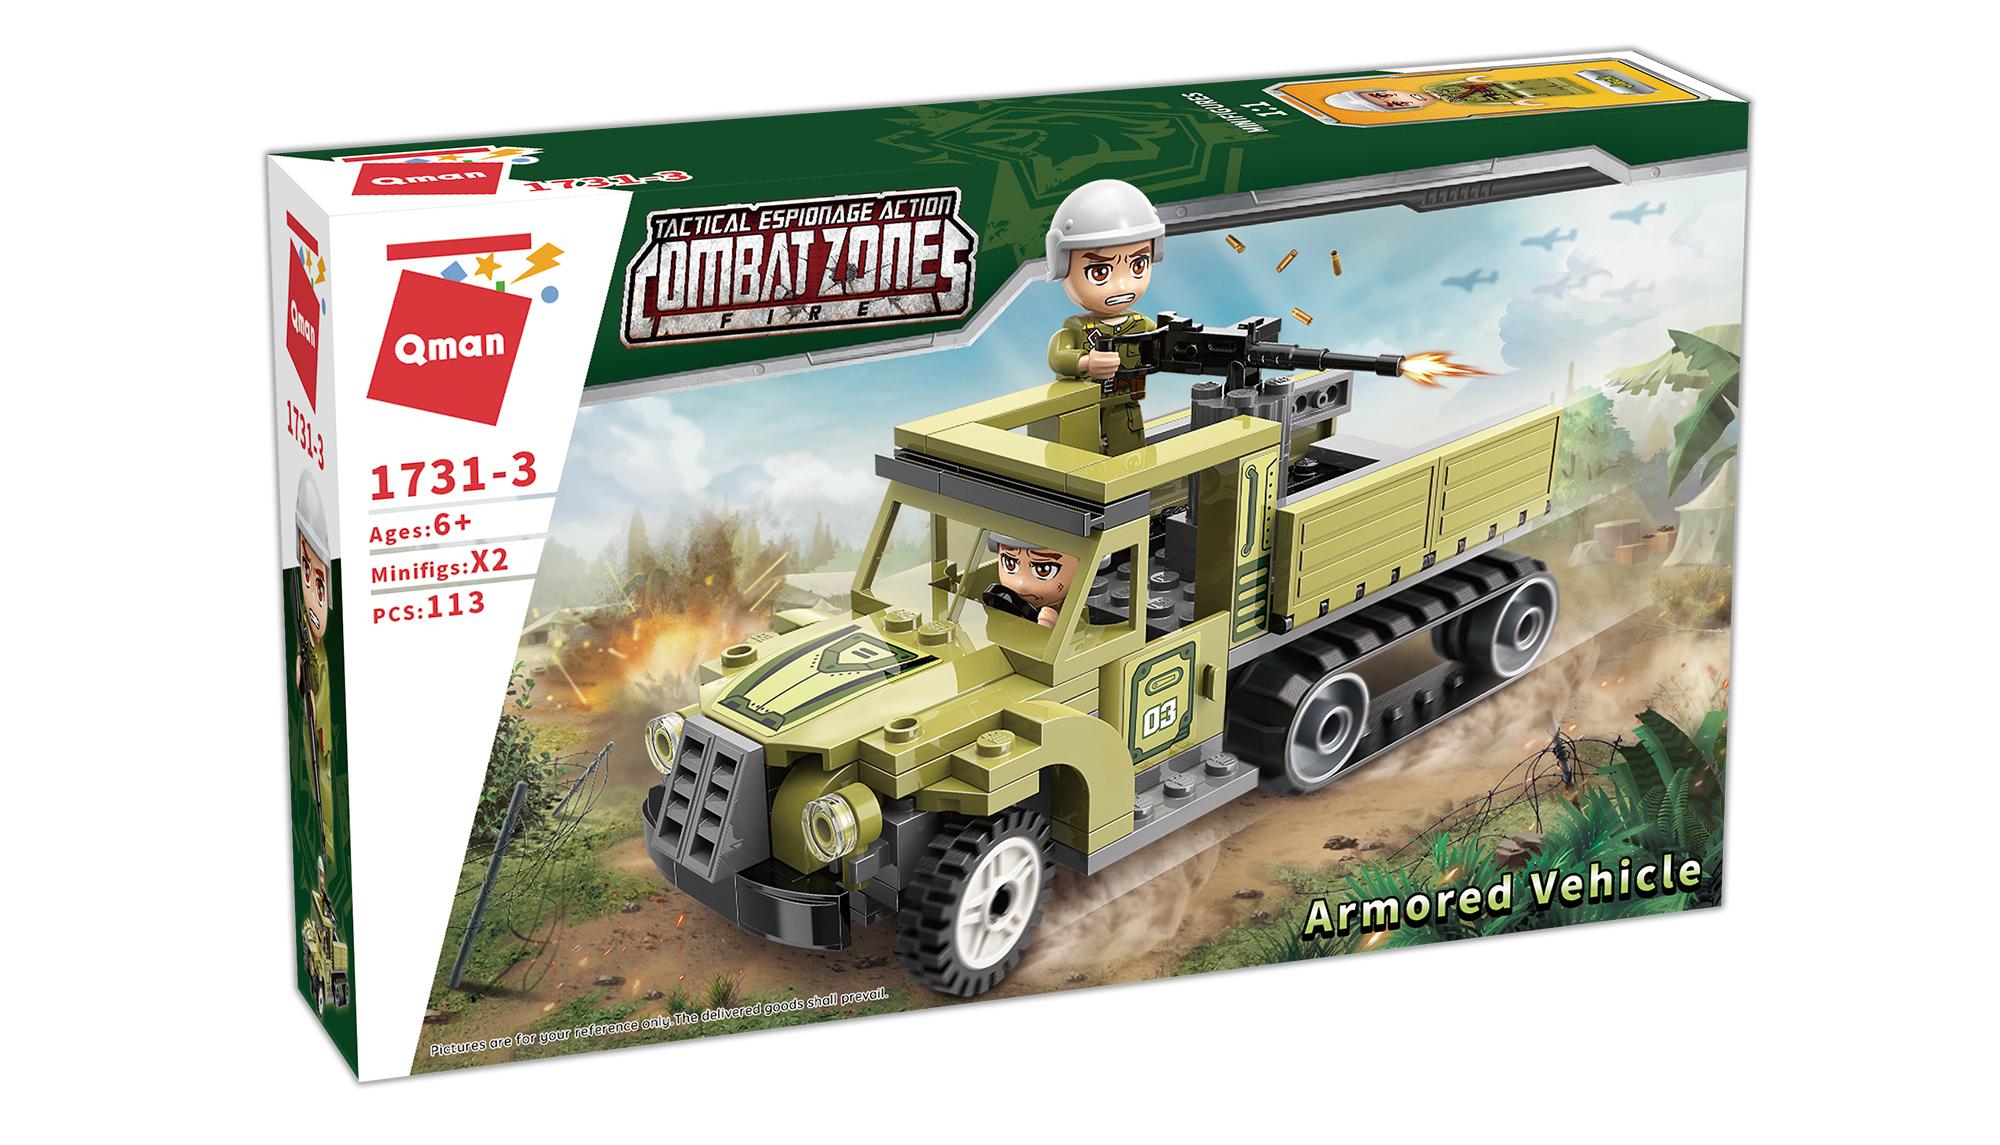 Qman Combat Zone 1731-3 Obrněné vozidlo